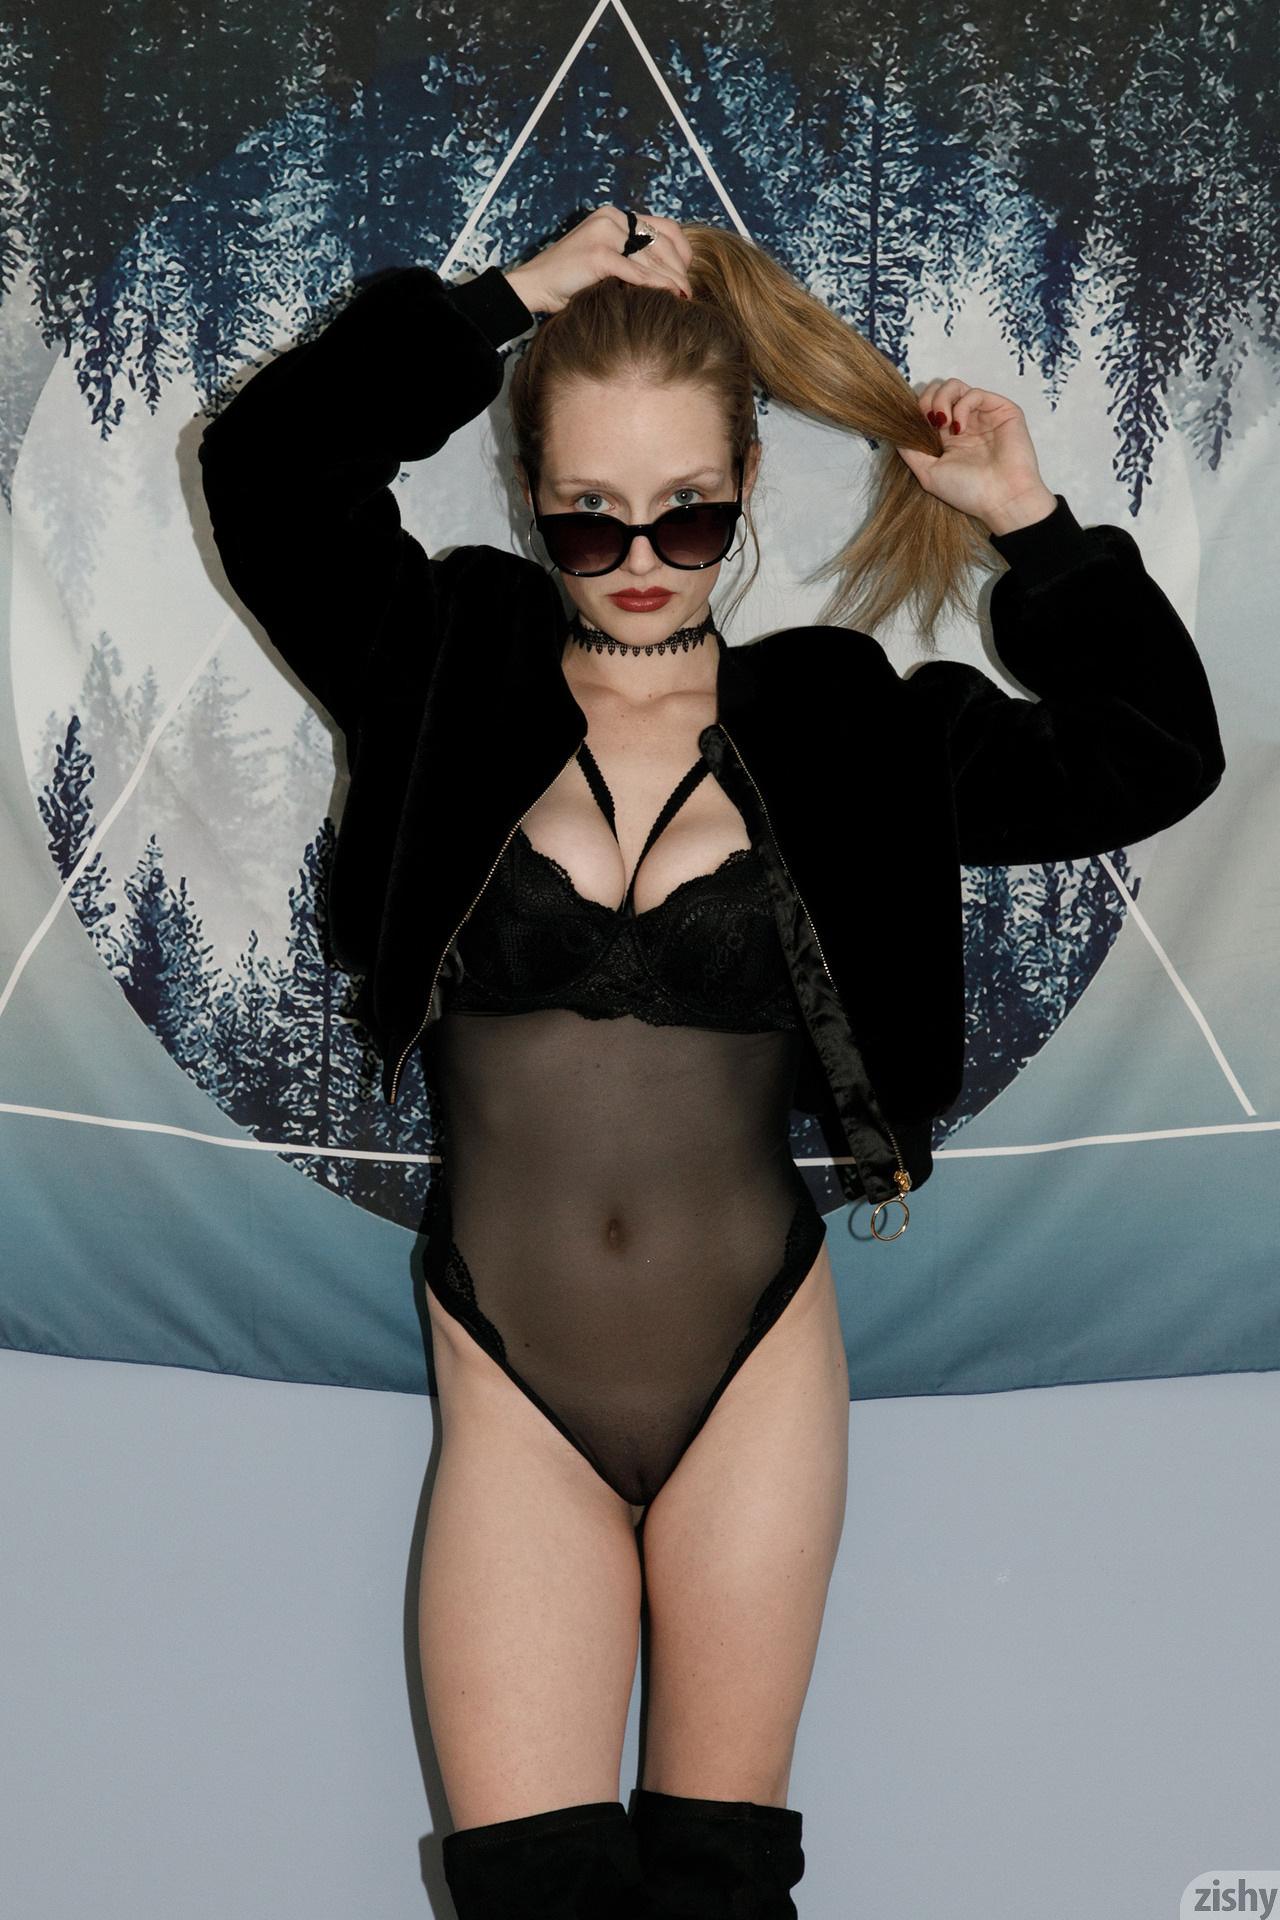 Giana Van Patten Black Coke Mirror Zishy (2)